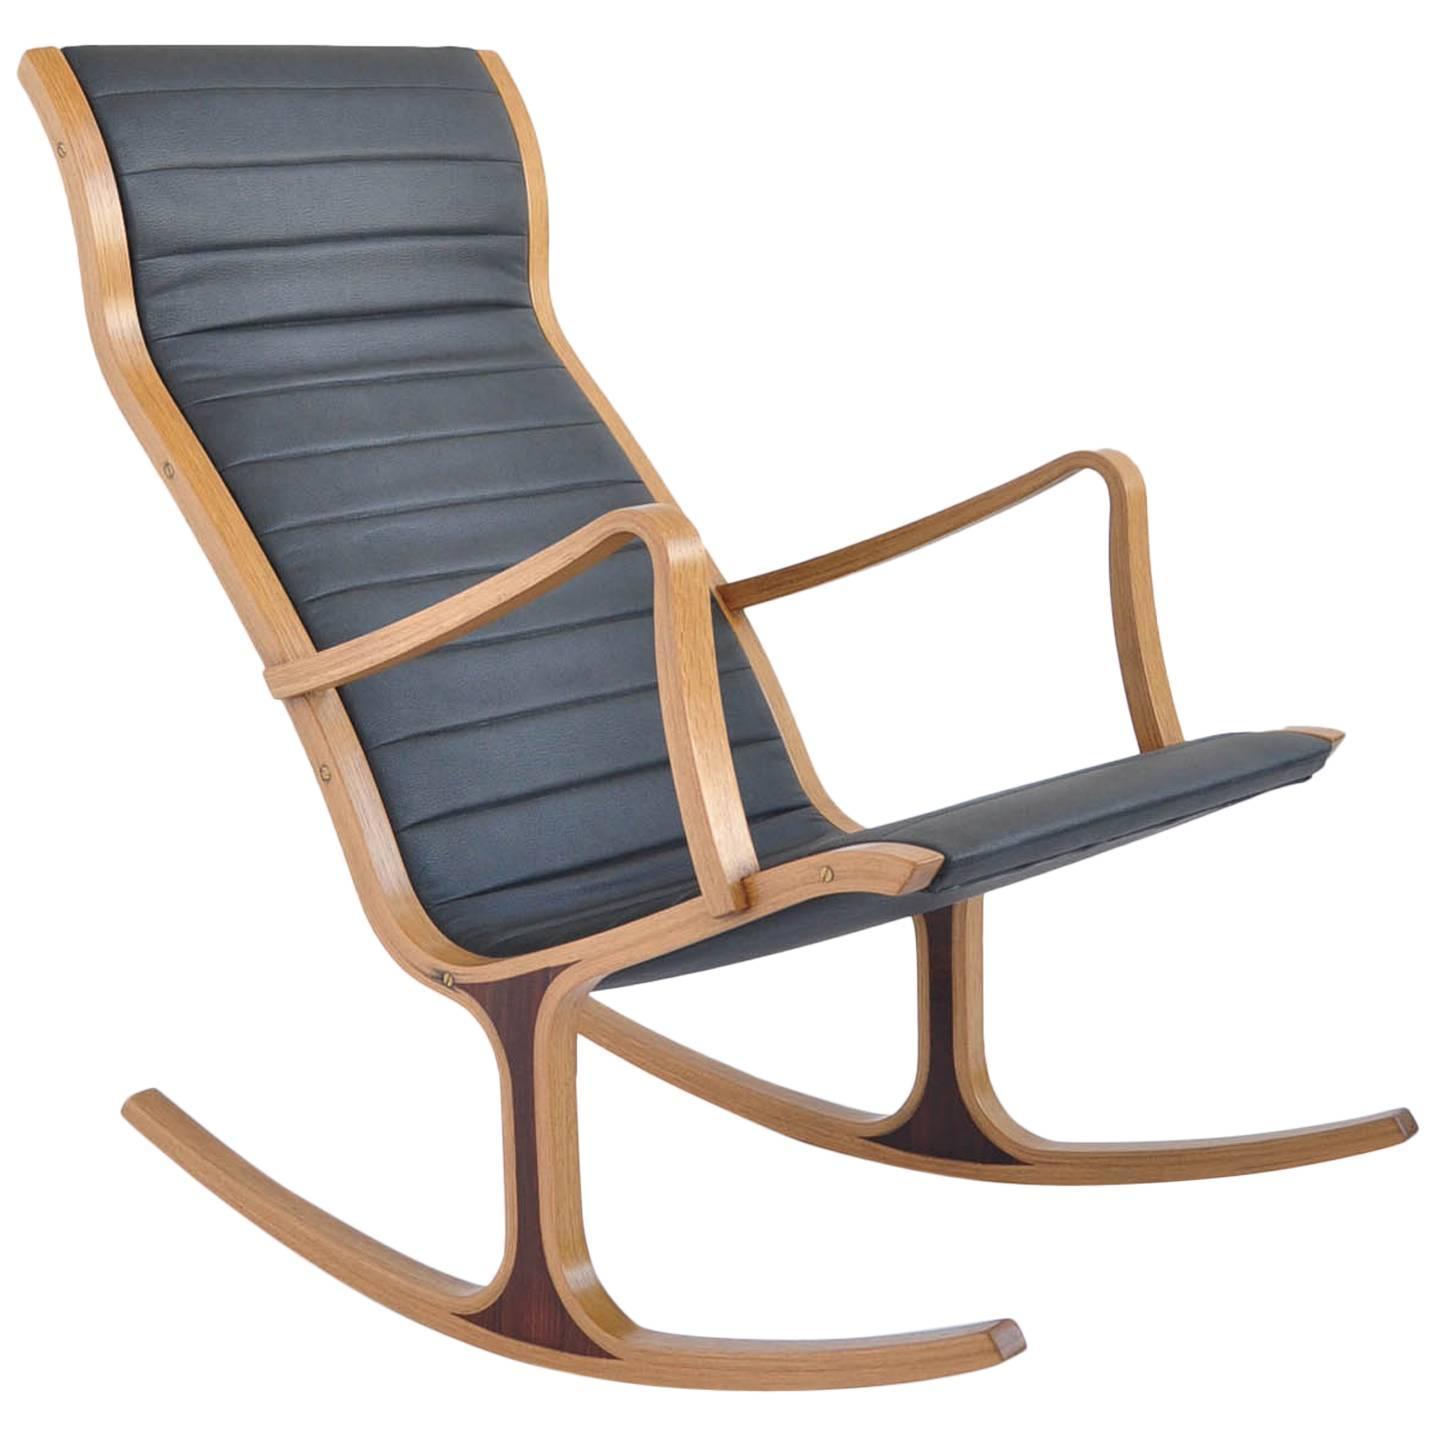 Bent Oak Quot Heron Quot Rocking Chair By Mitsumasa Sugasawa For